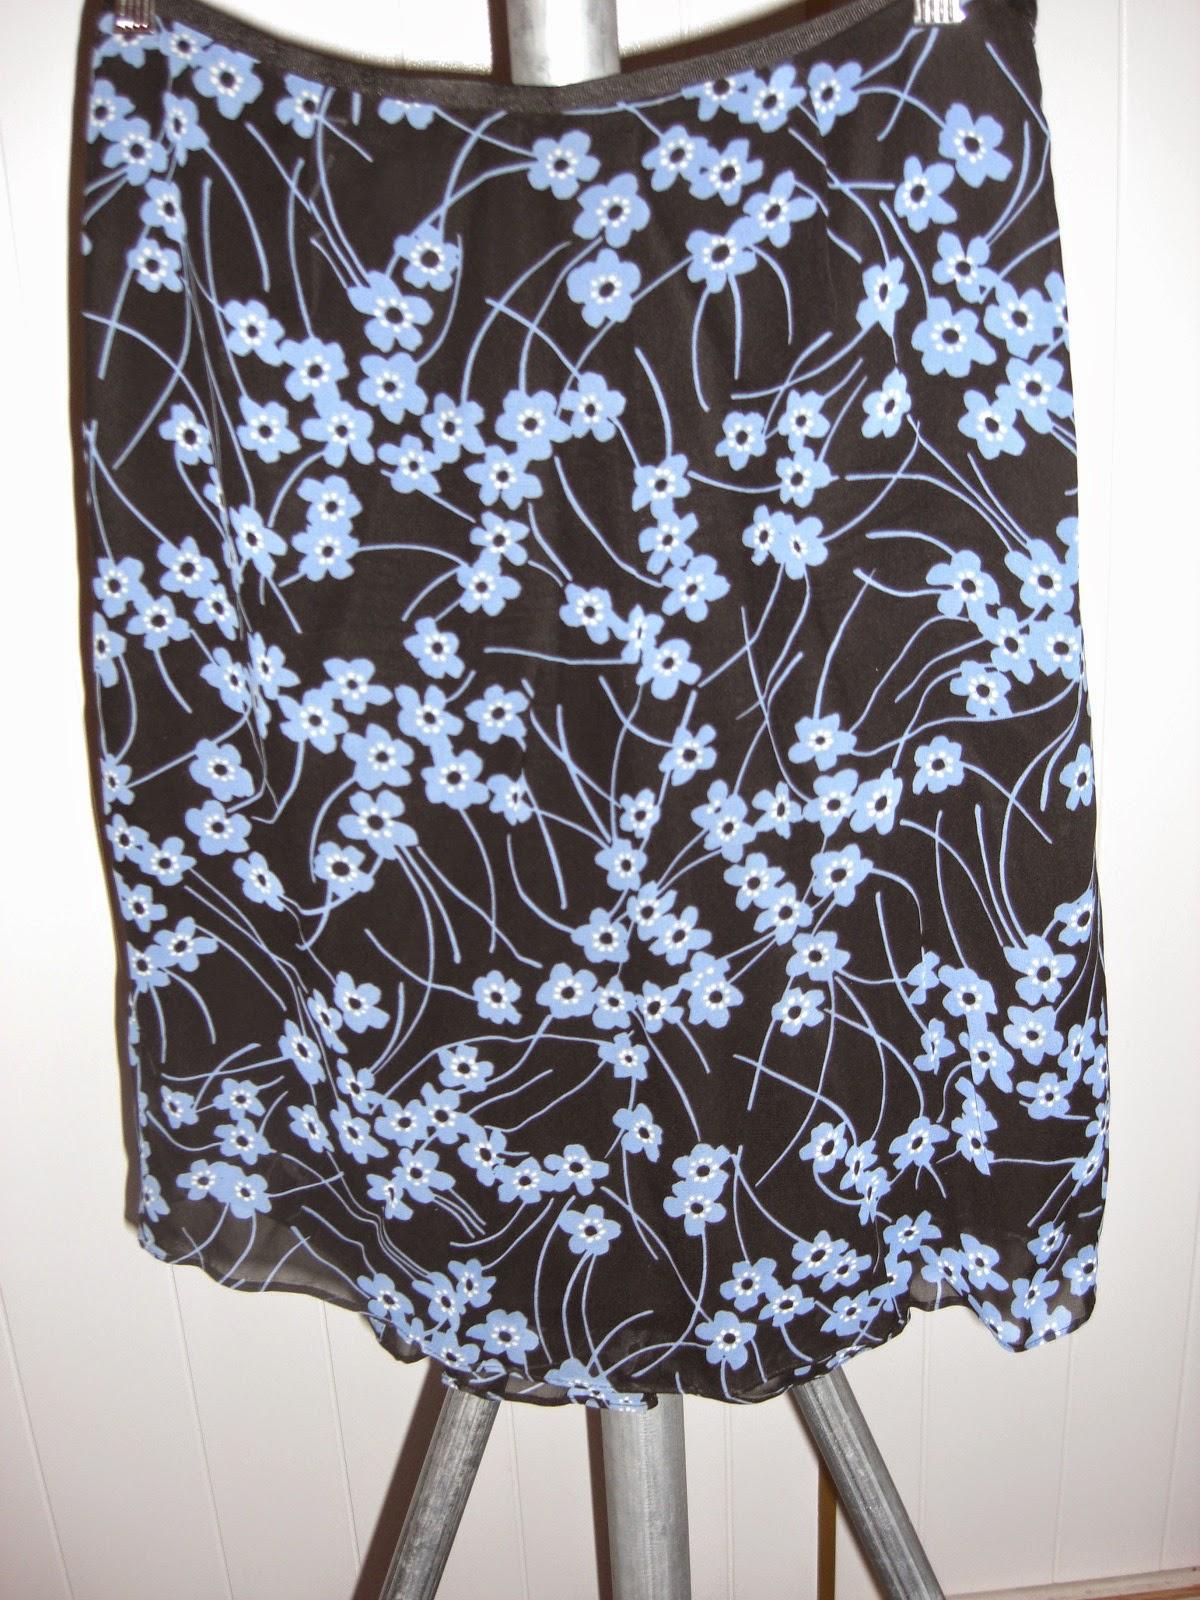 http://bargaincart.ecrater.com/p/17024612/ann-taylor-blue-violets-on-black?keywords=ann+taylor